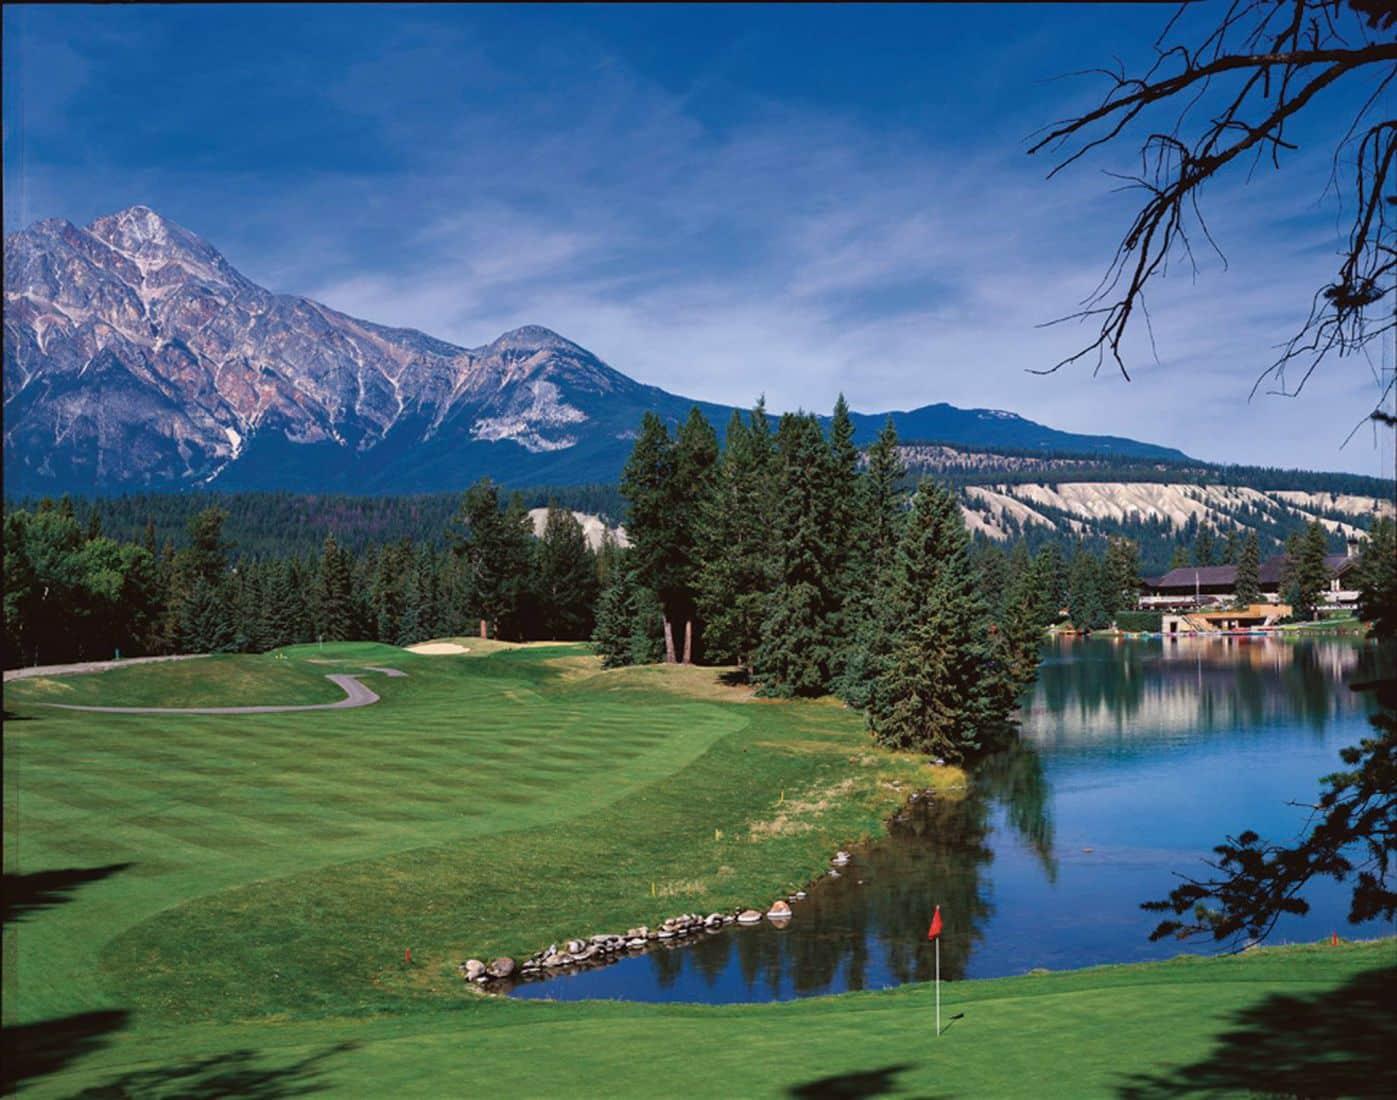 fairmont-jasper-park-golf-21